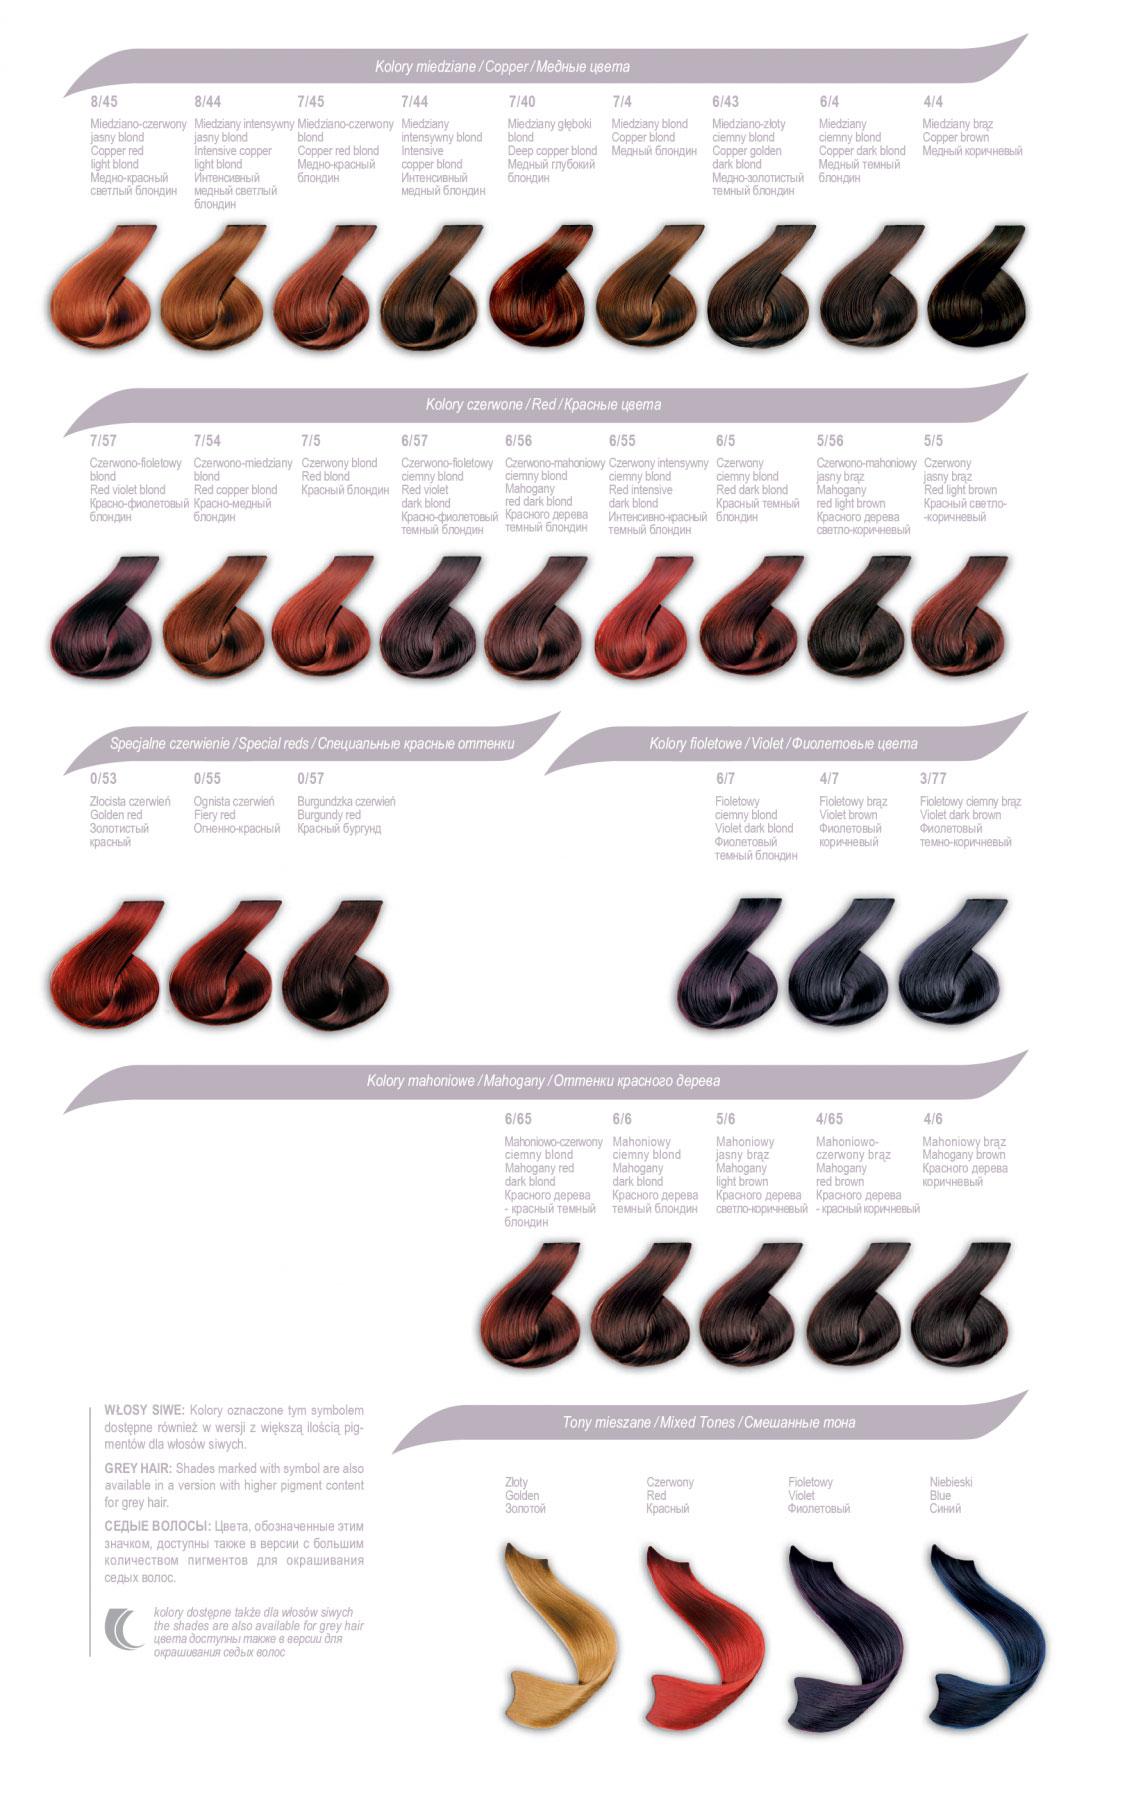 Katalog farb Cece